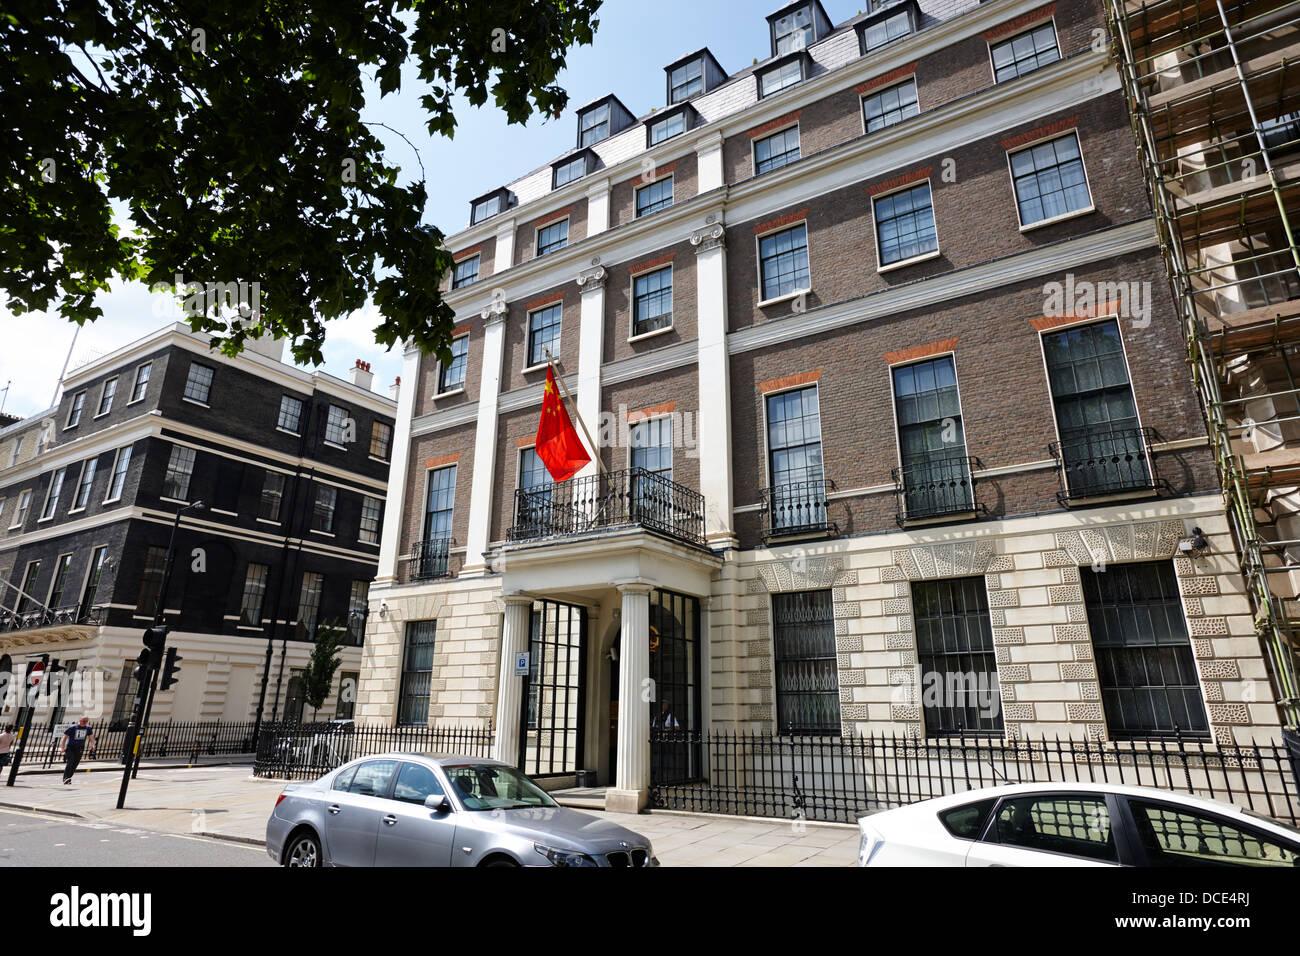 embassy of the peoples republic of china London England UK - Stock Image